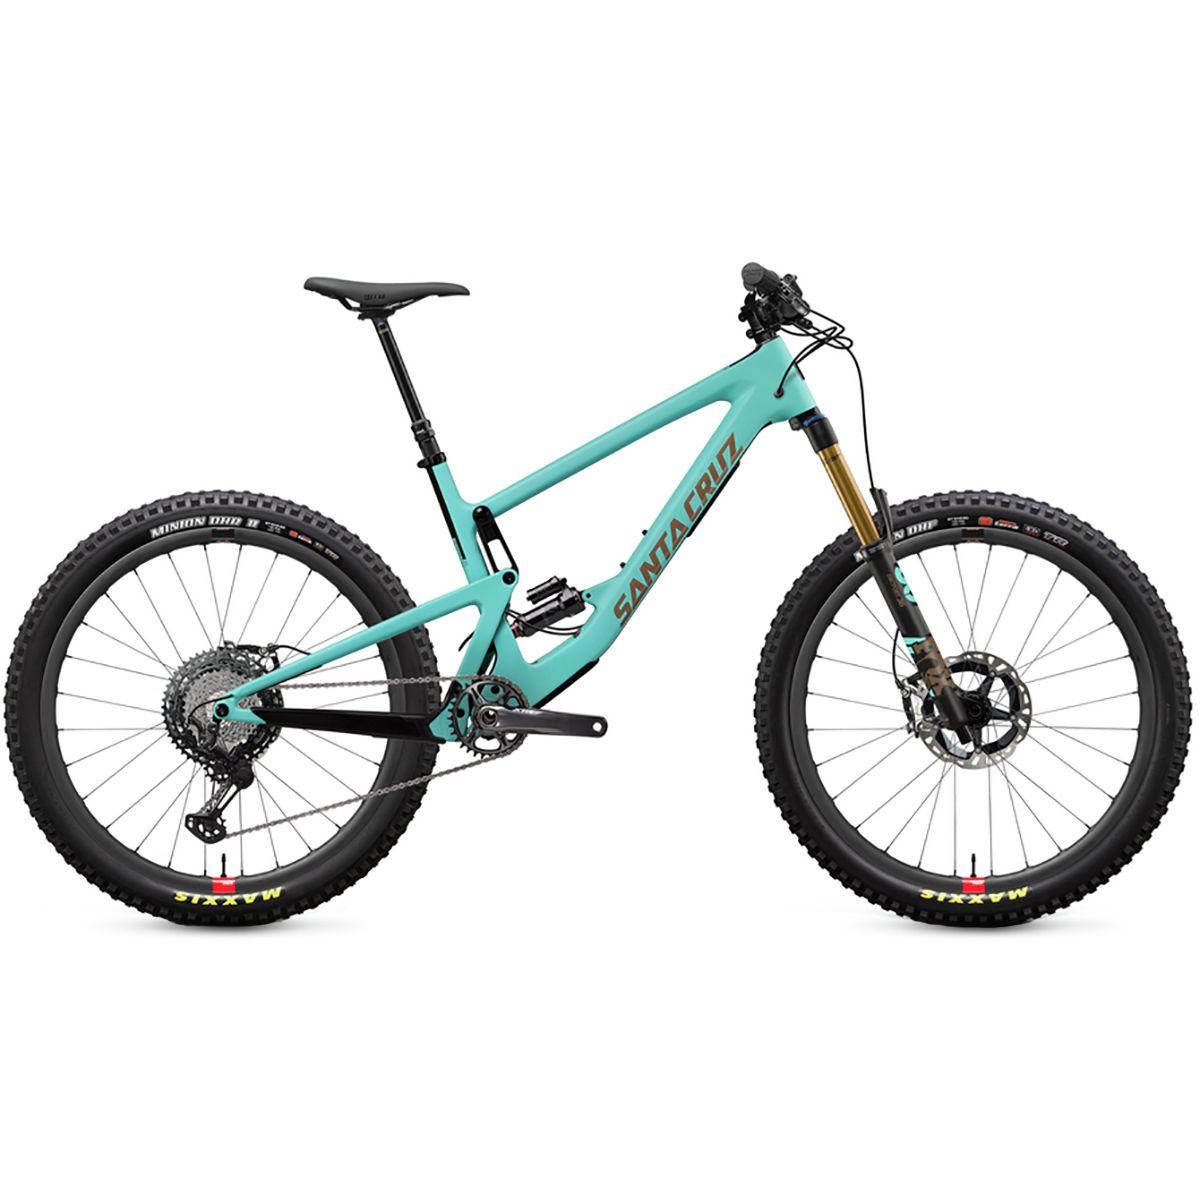 Santa Cruz Bicycles Bronson Carbon CC 27.5 XTR Reserve Complete